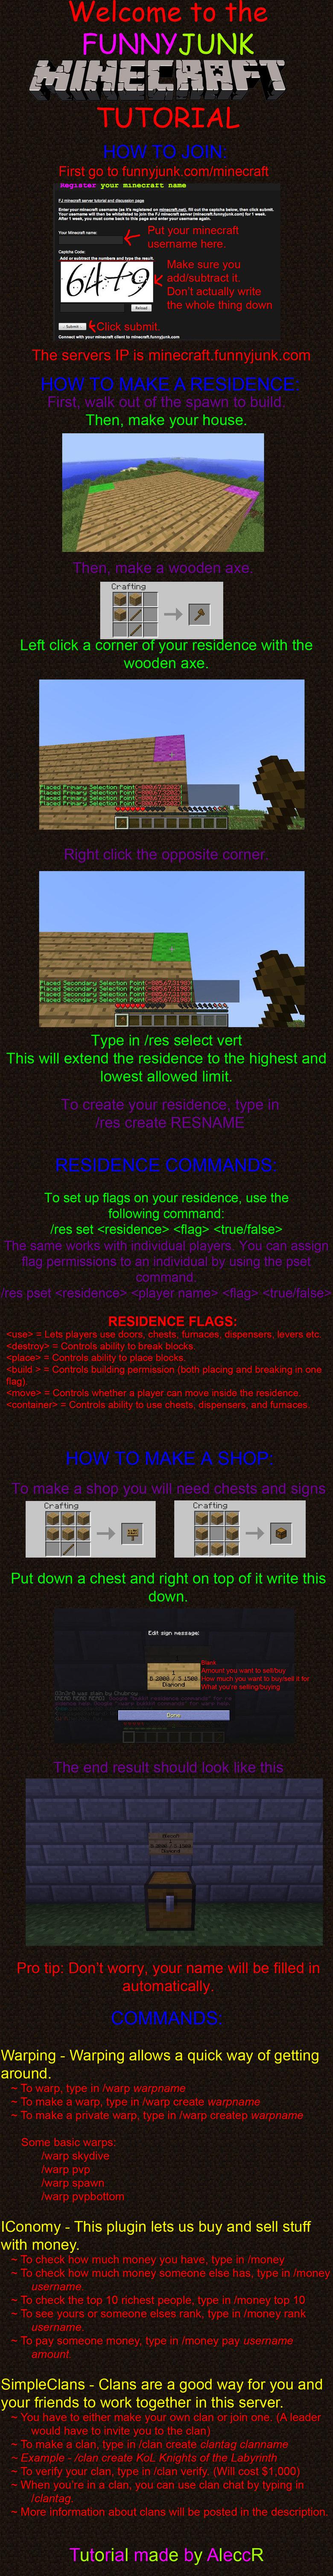 MINECRAFT FUNNYJUNK TUTORIAL. Residence Plugin: residencebukkitmod.wikispaces.com/ SimpleClans Plugin: dev.bukkit.org/server-mods/simpleclans/ STOP ASKING STUPI Minecraft FUNNYJUNK tutorial